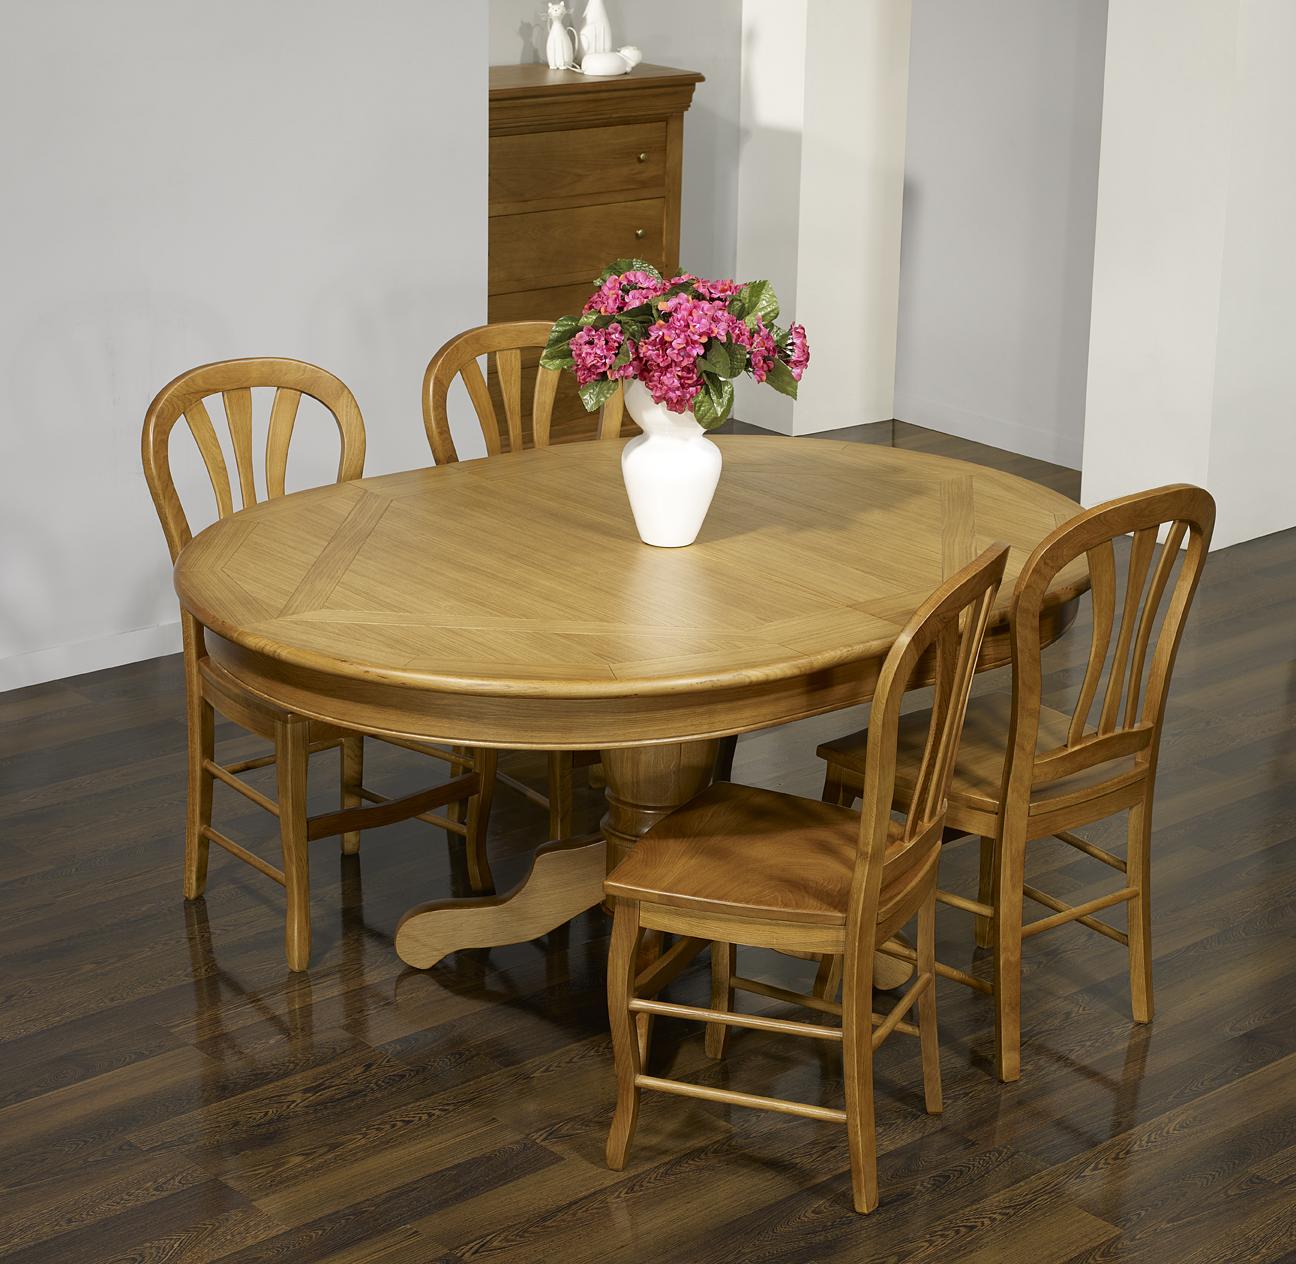 table ovale pied central fred ric 160x120 en ch ne de style louis philippe meuble en ch ne massif. Black Bedroom Furniture Sets. Home Design Ideas